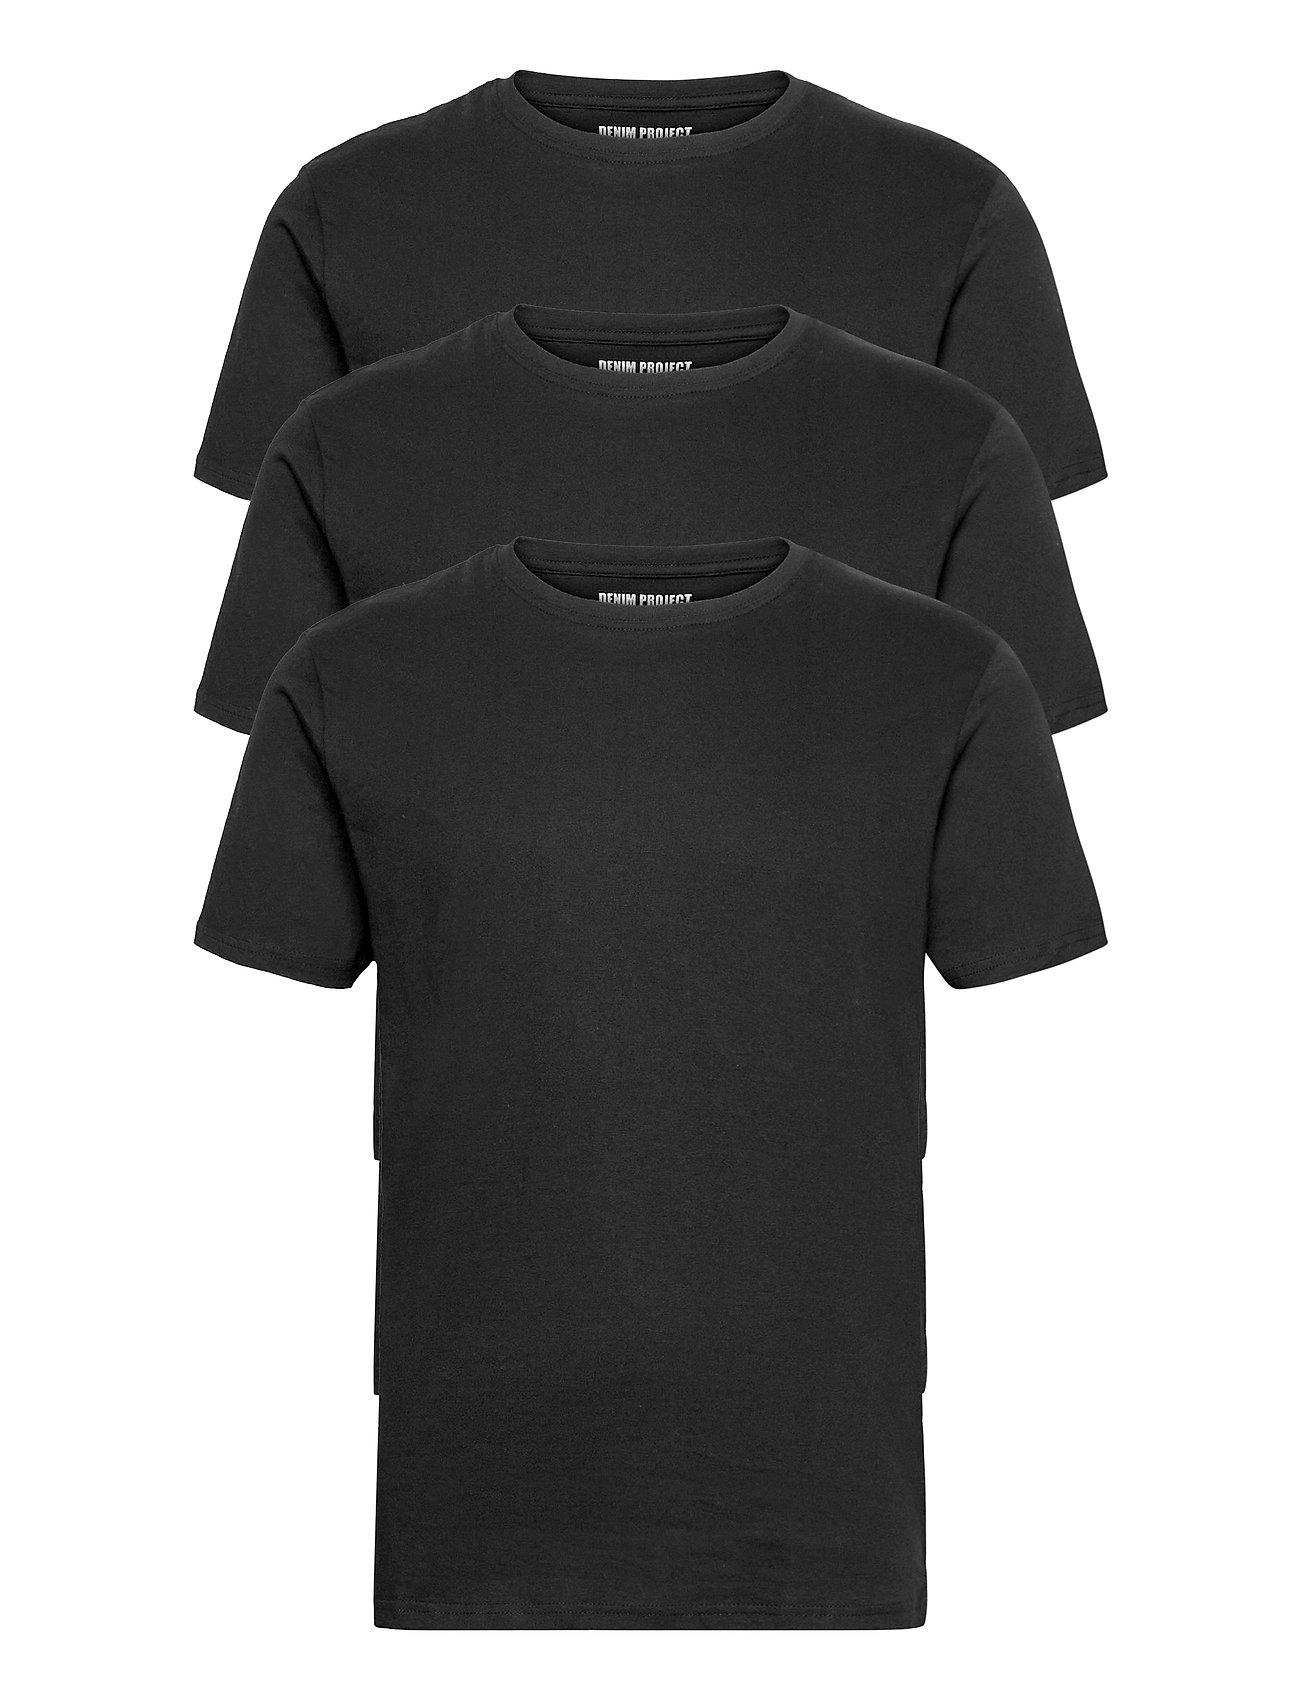 Image of 3 Pack T-Shirts T-shirt Sort Denim Project (3484641455)